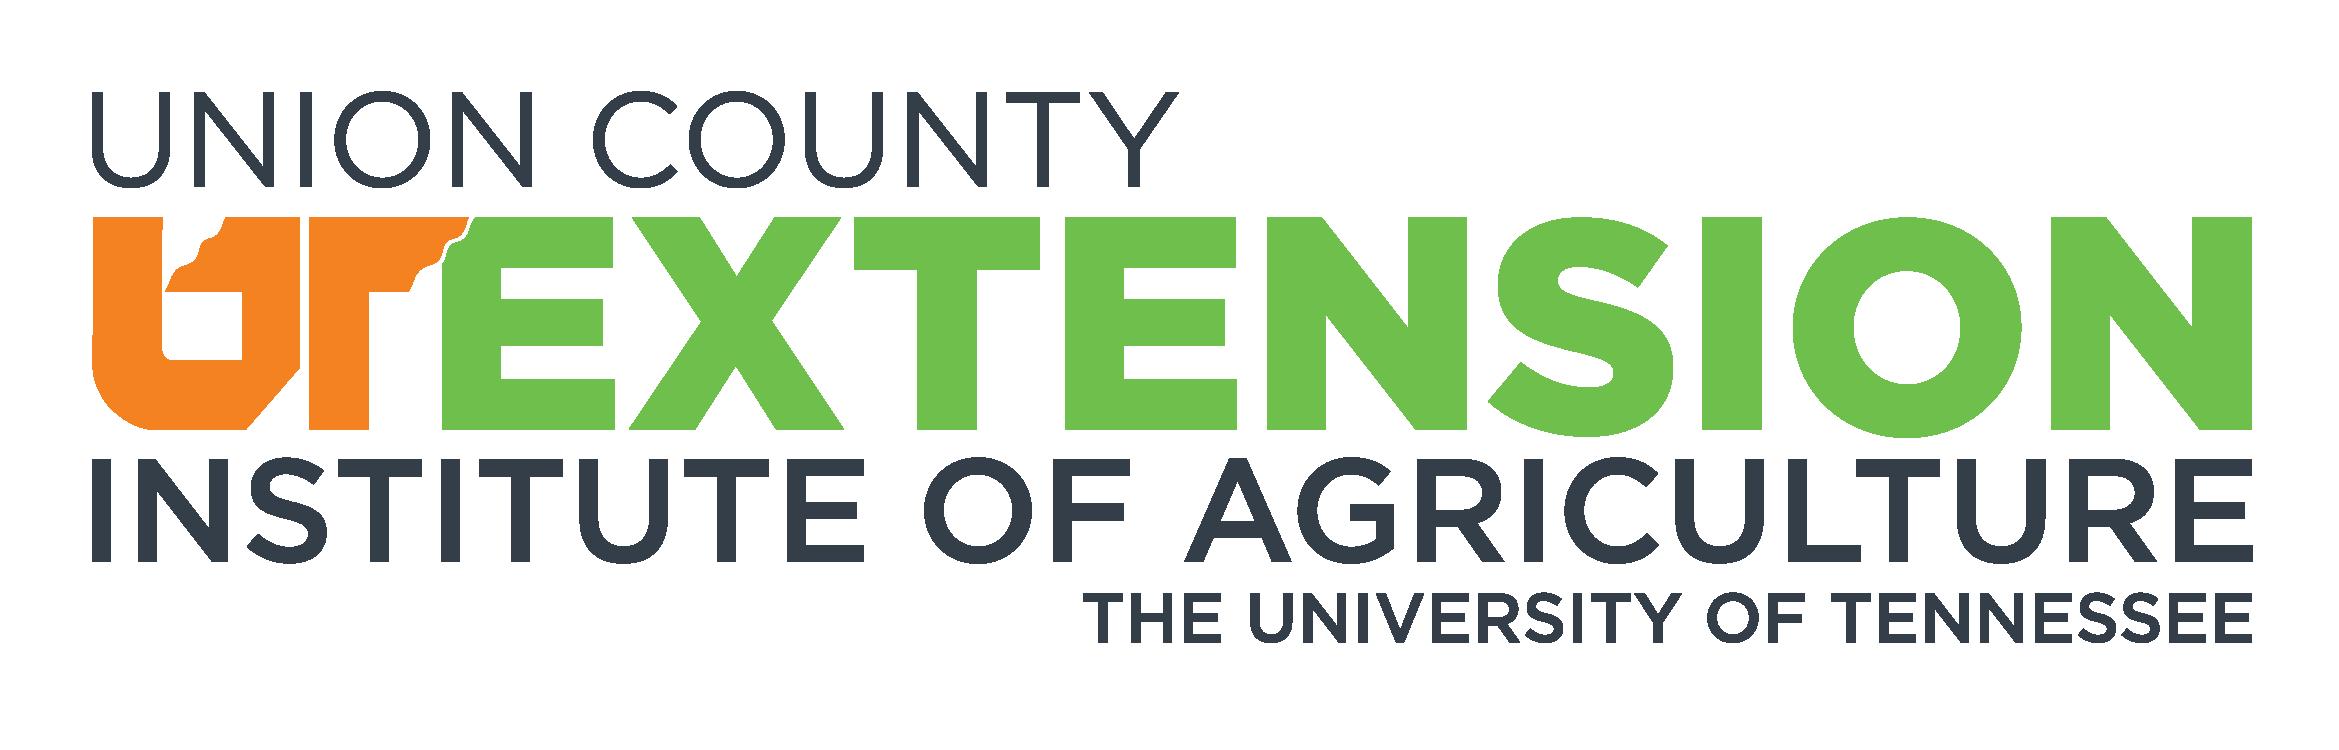 Union County UT Extension logo